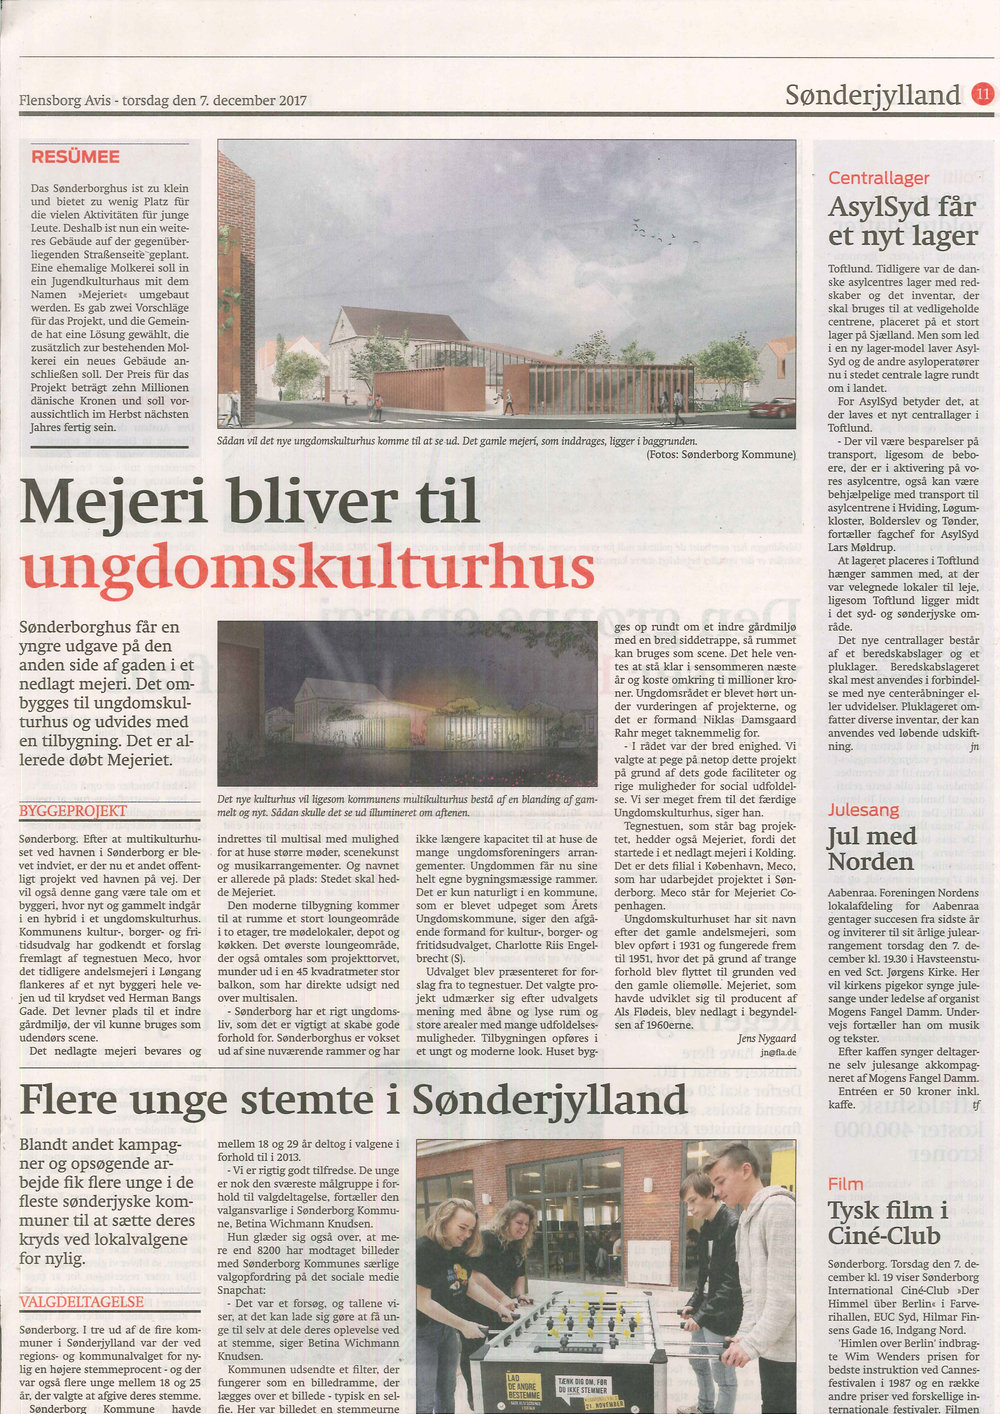 Meco Architects - Ungdomskulturhus Sønderborg